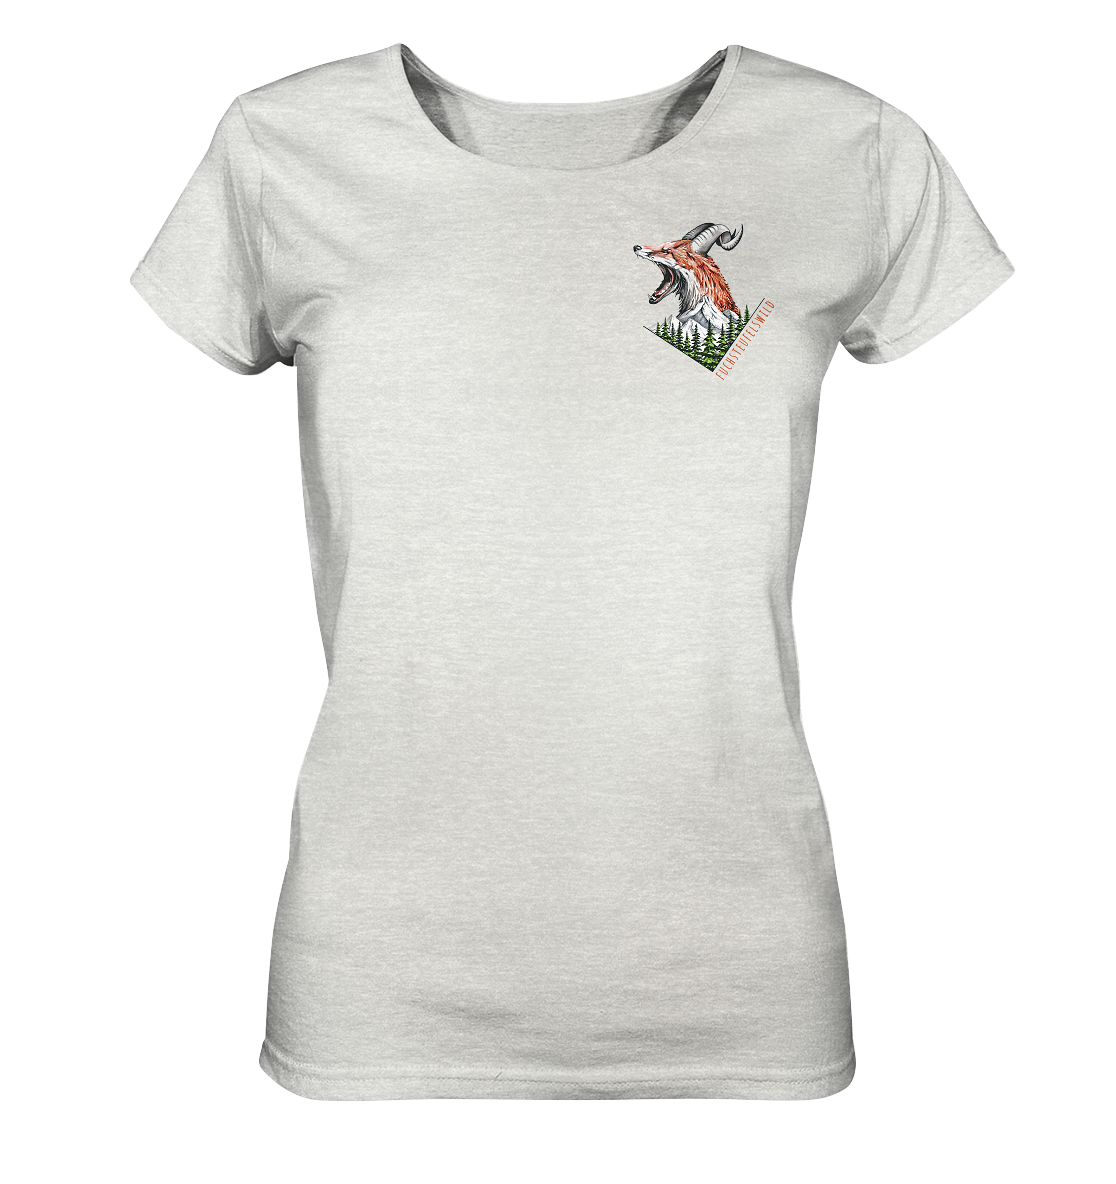 front-ladies-organic-shirt-meliert-f2f5f3-1116x-2.png